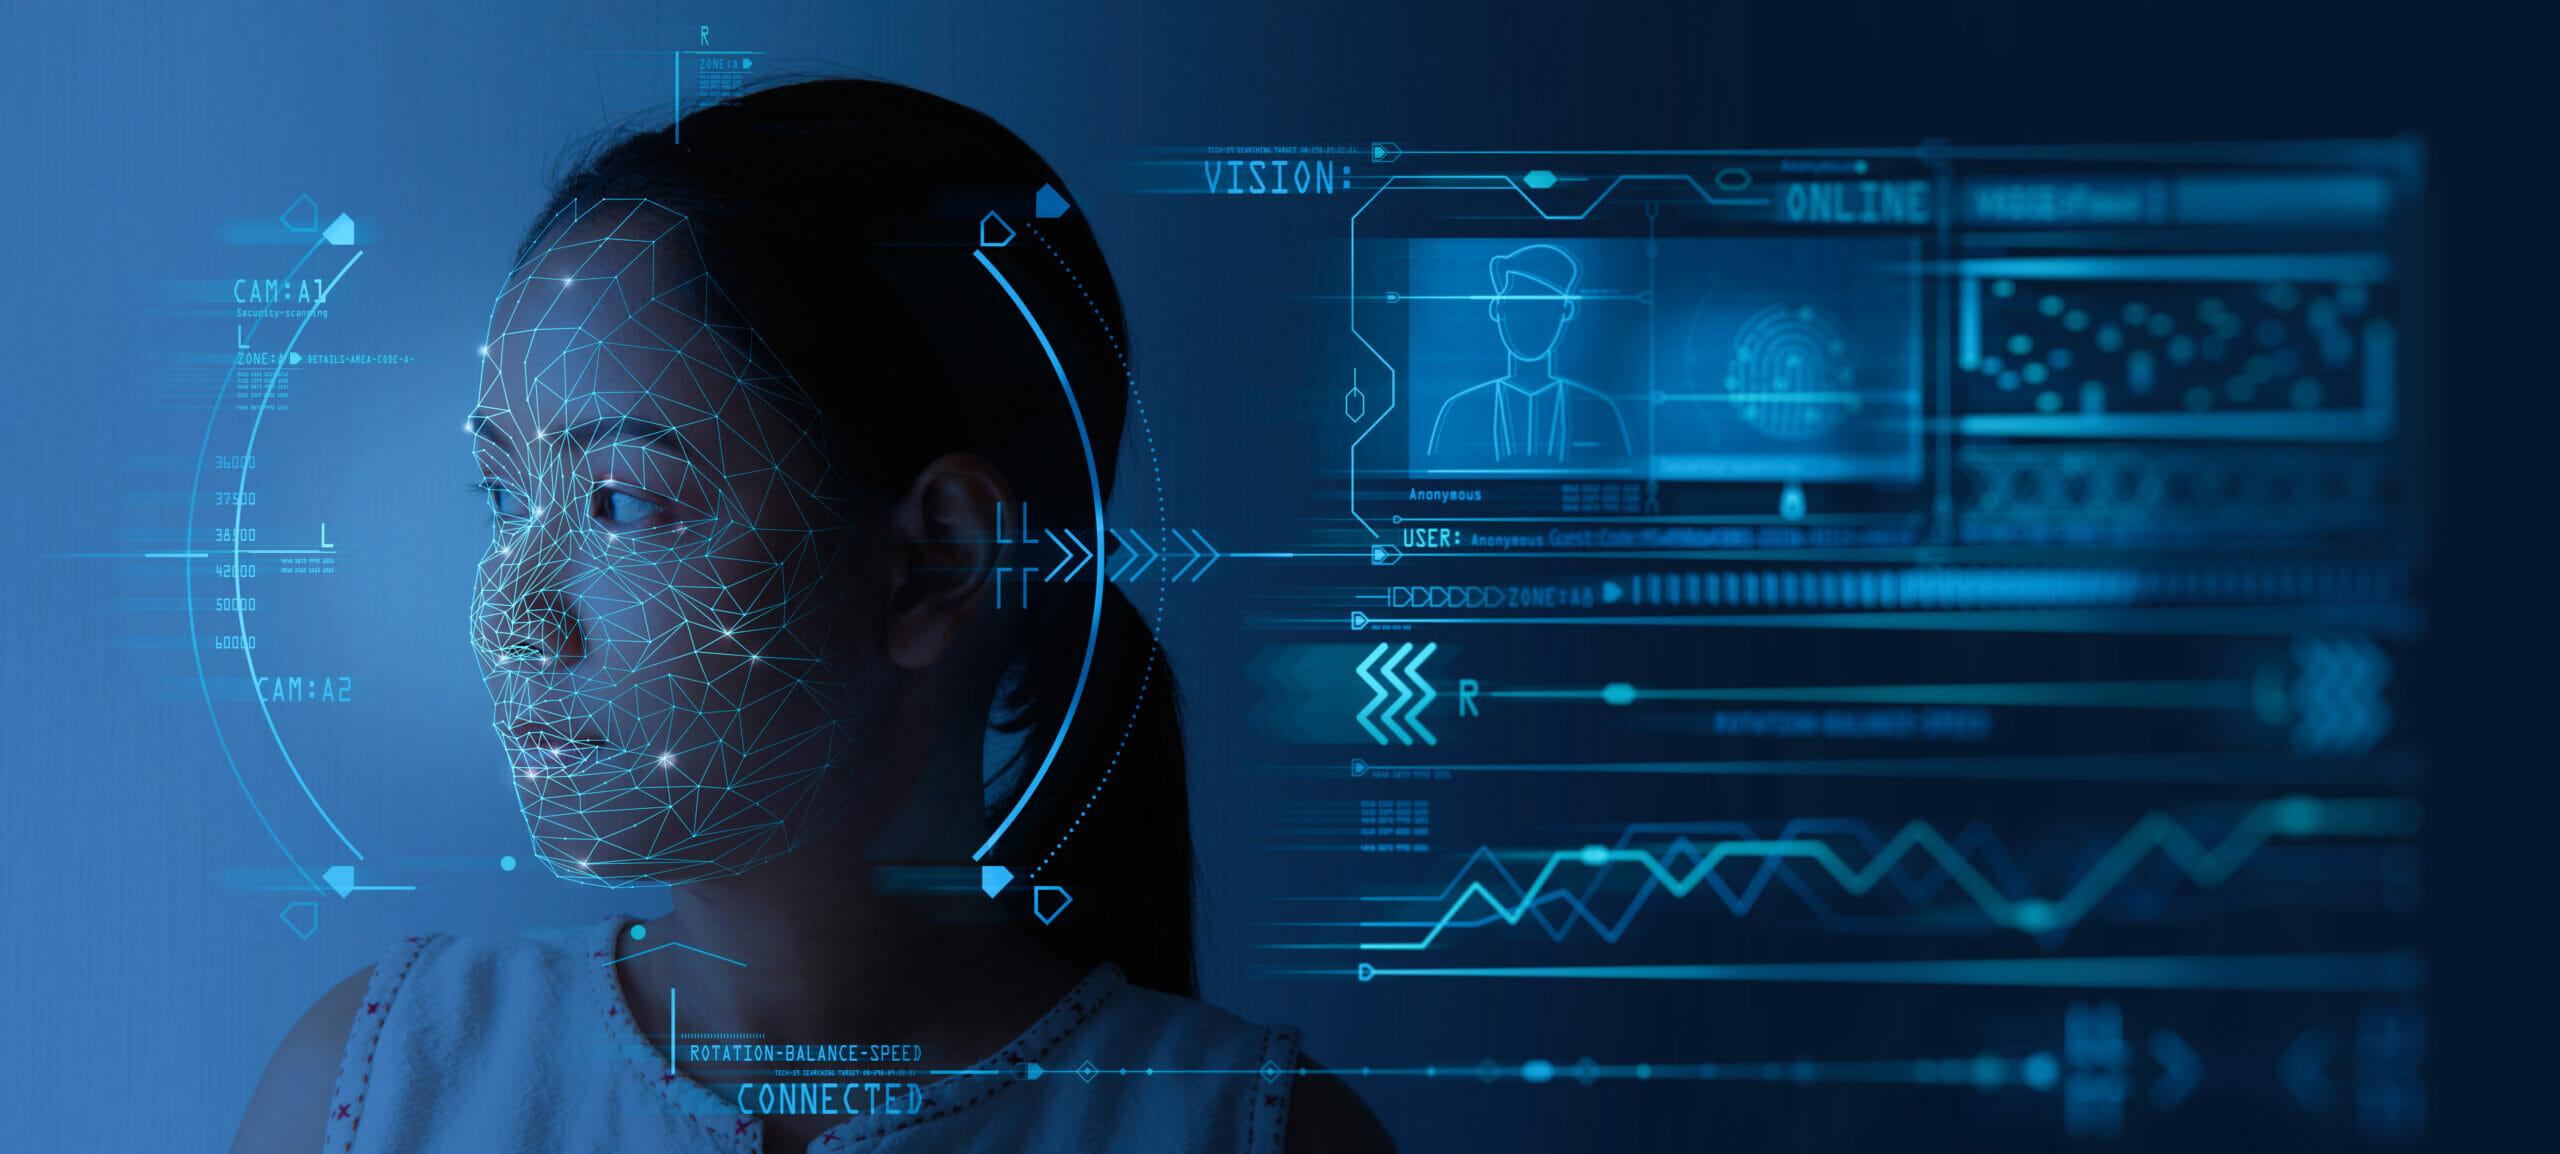 An immigrant submits biometrics data